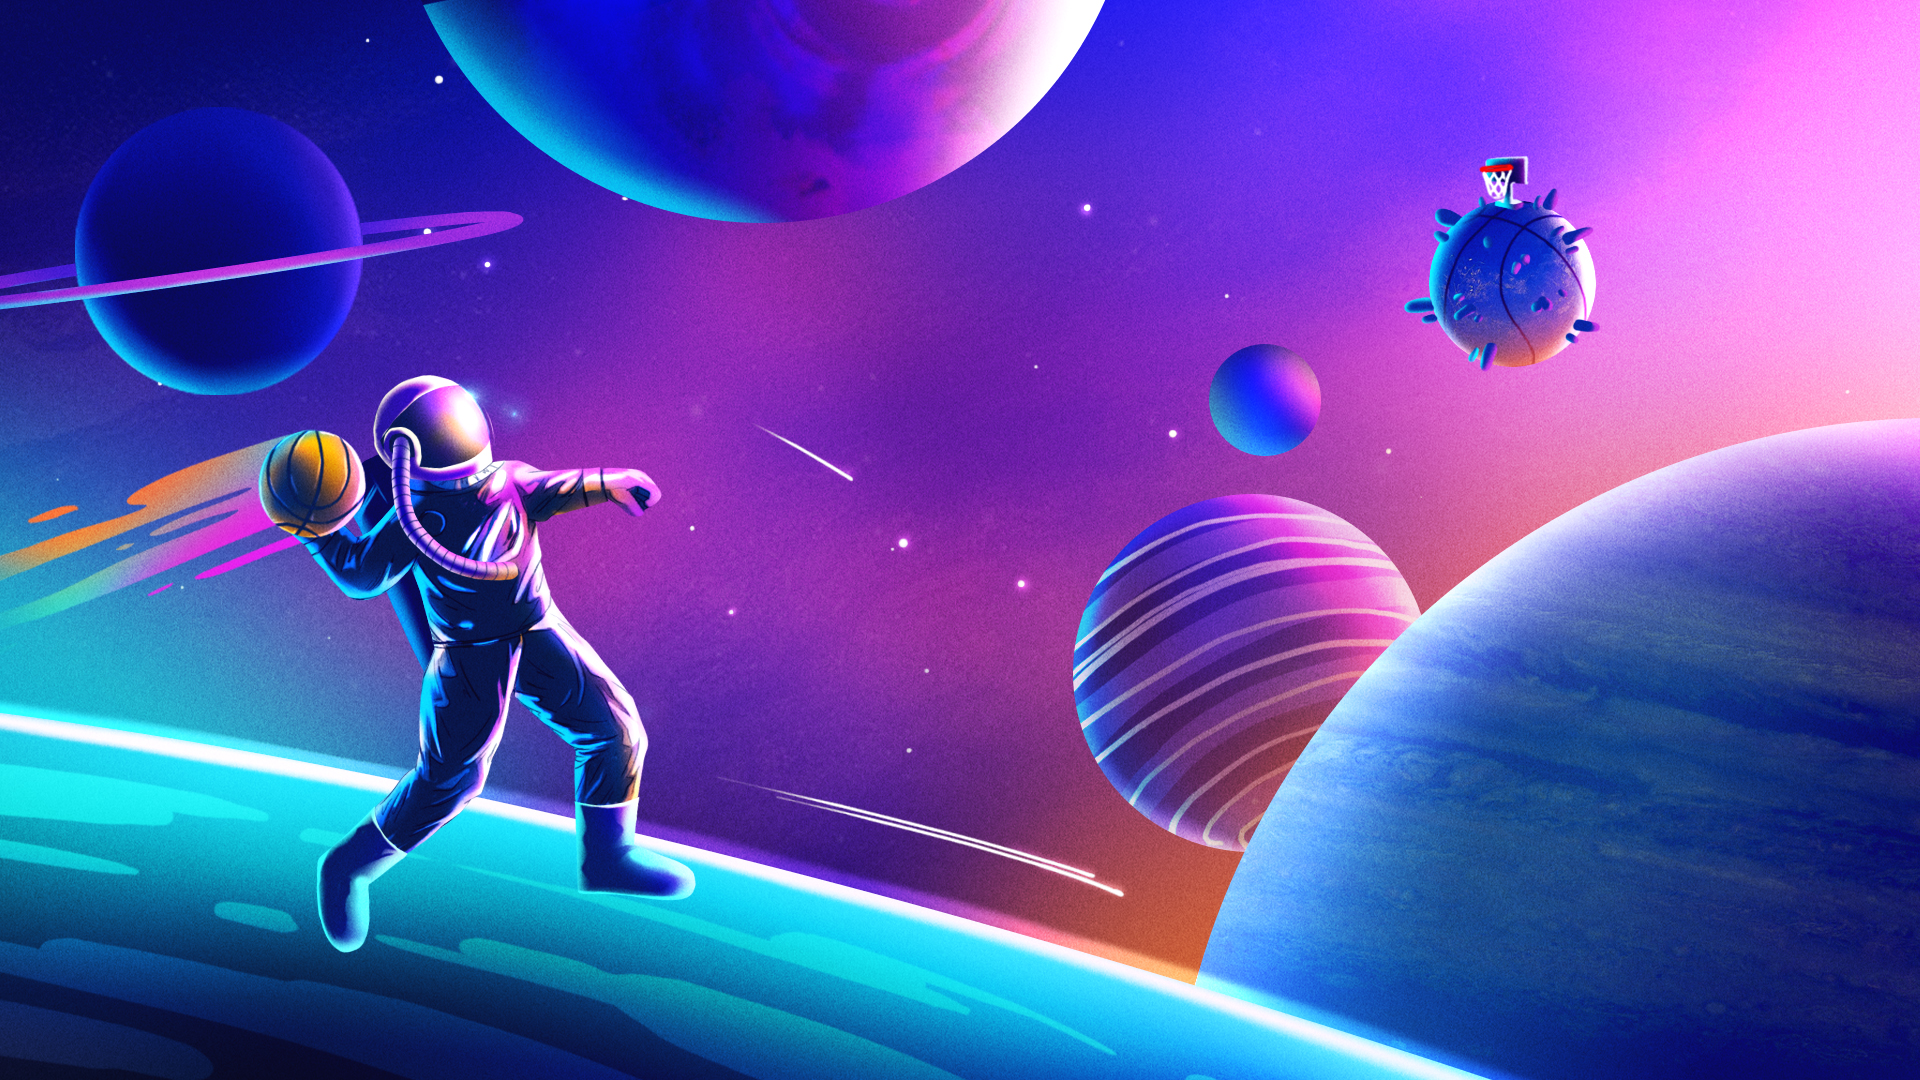 stardust_threepointer_spaceman_v002_jk.jpg